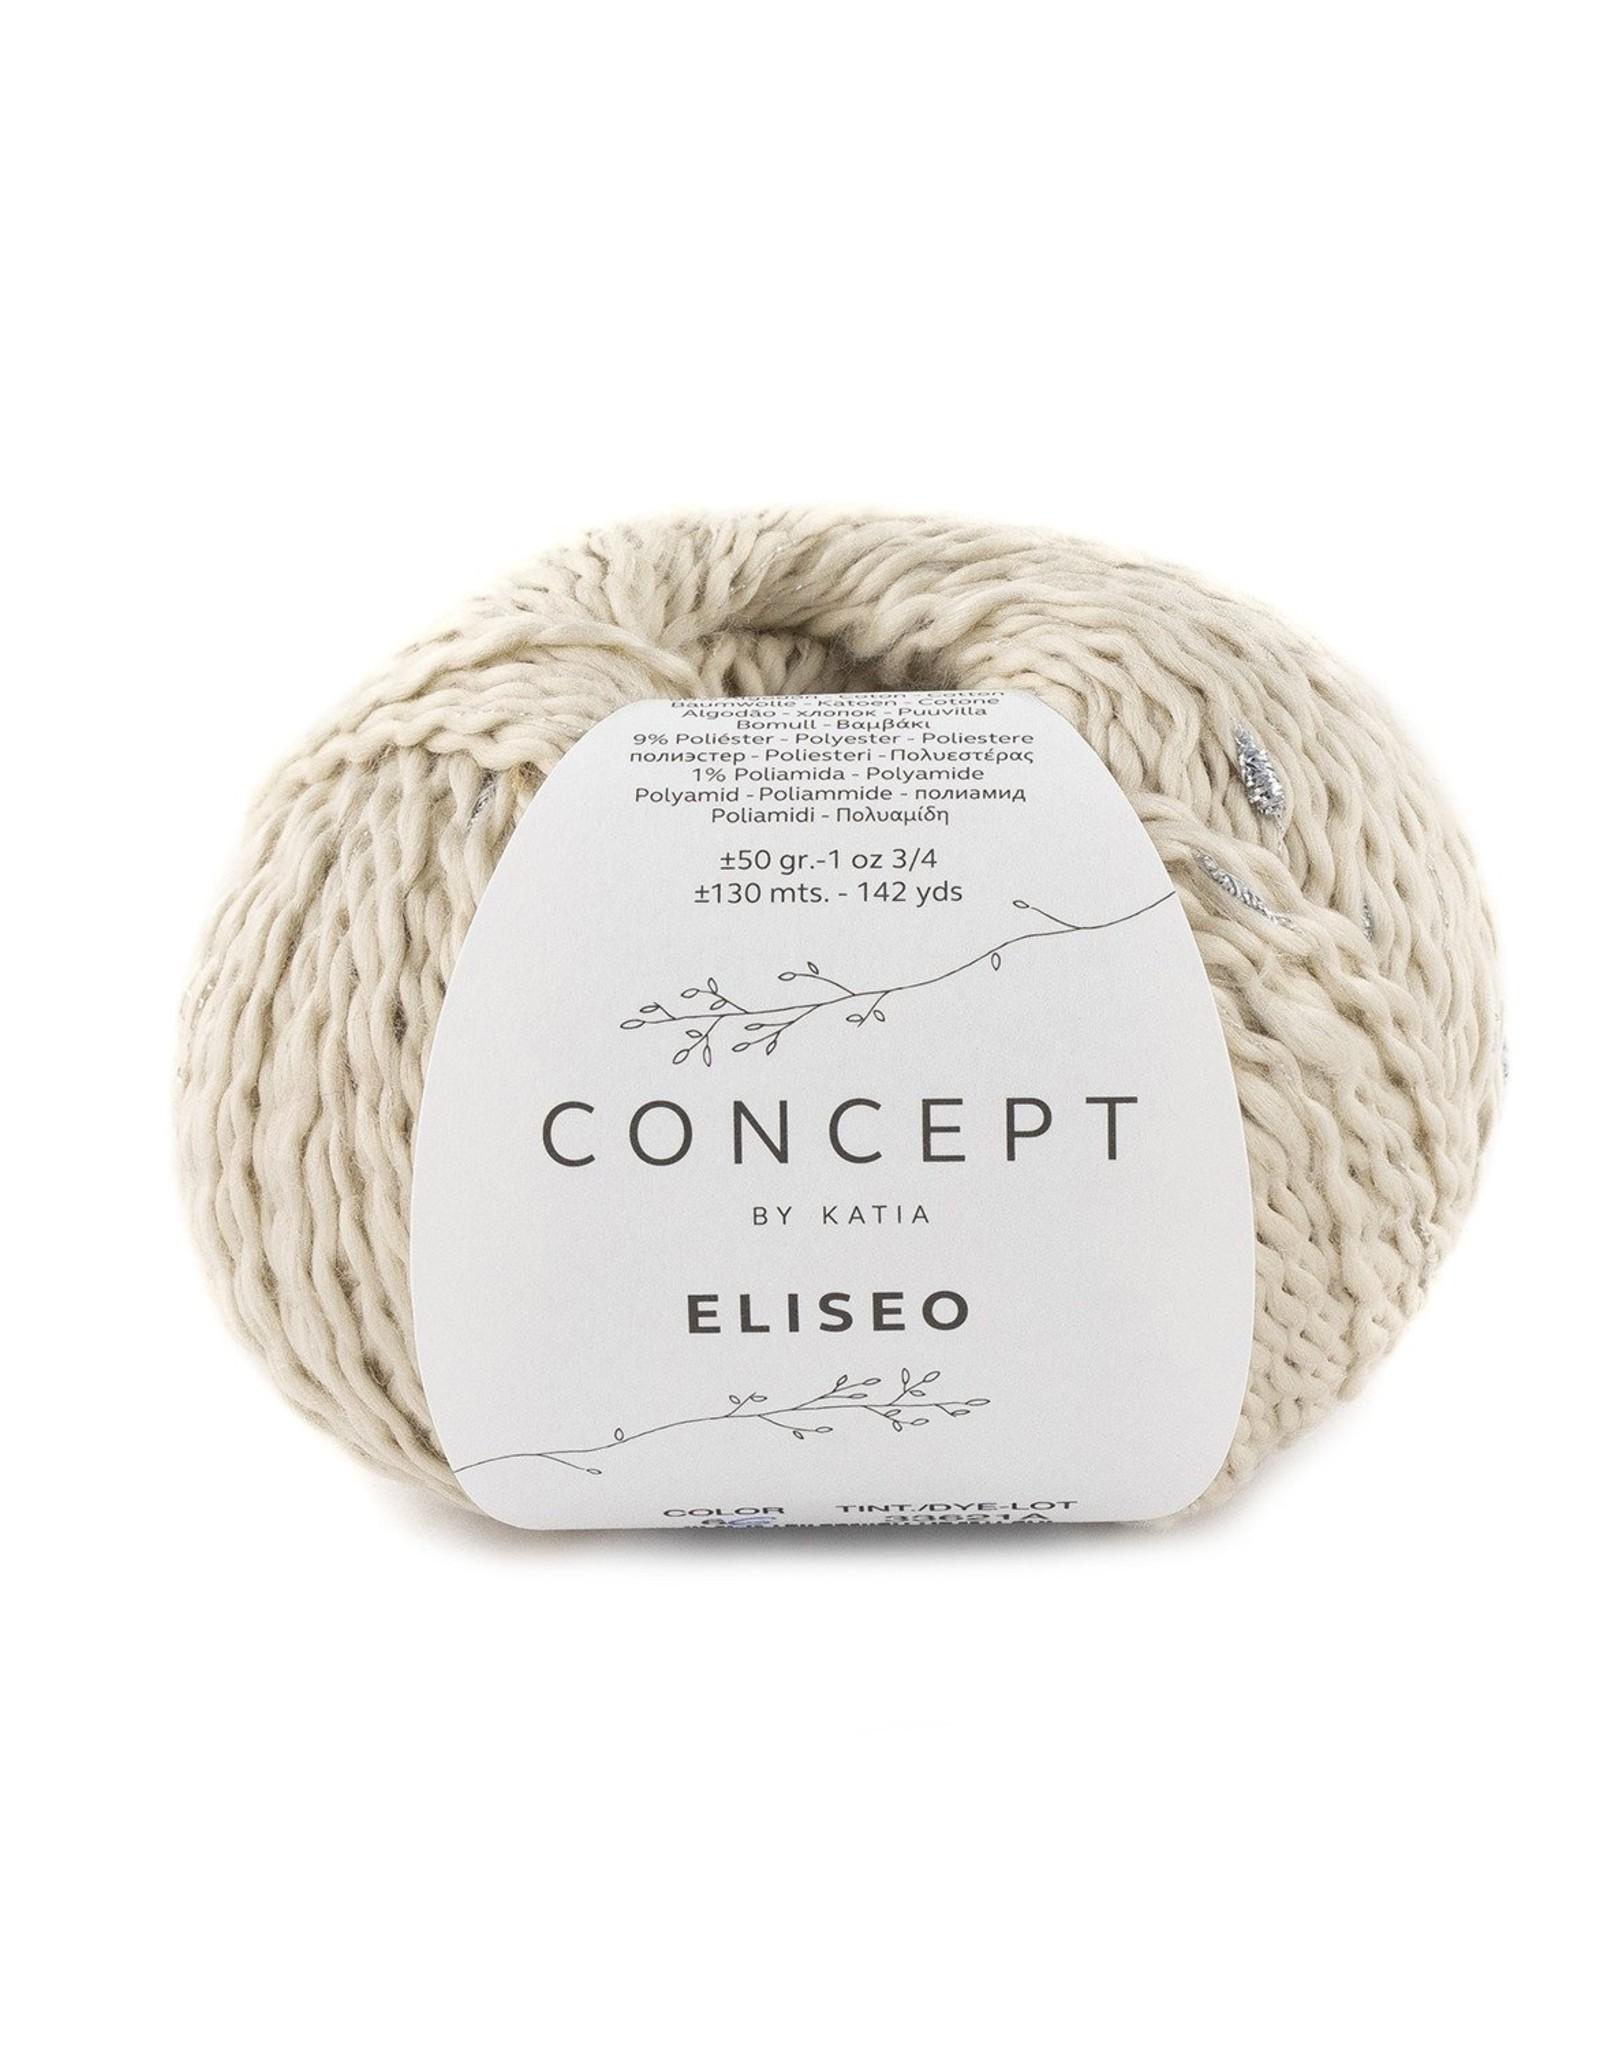 Katia Concept Eliseo